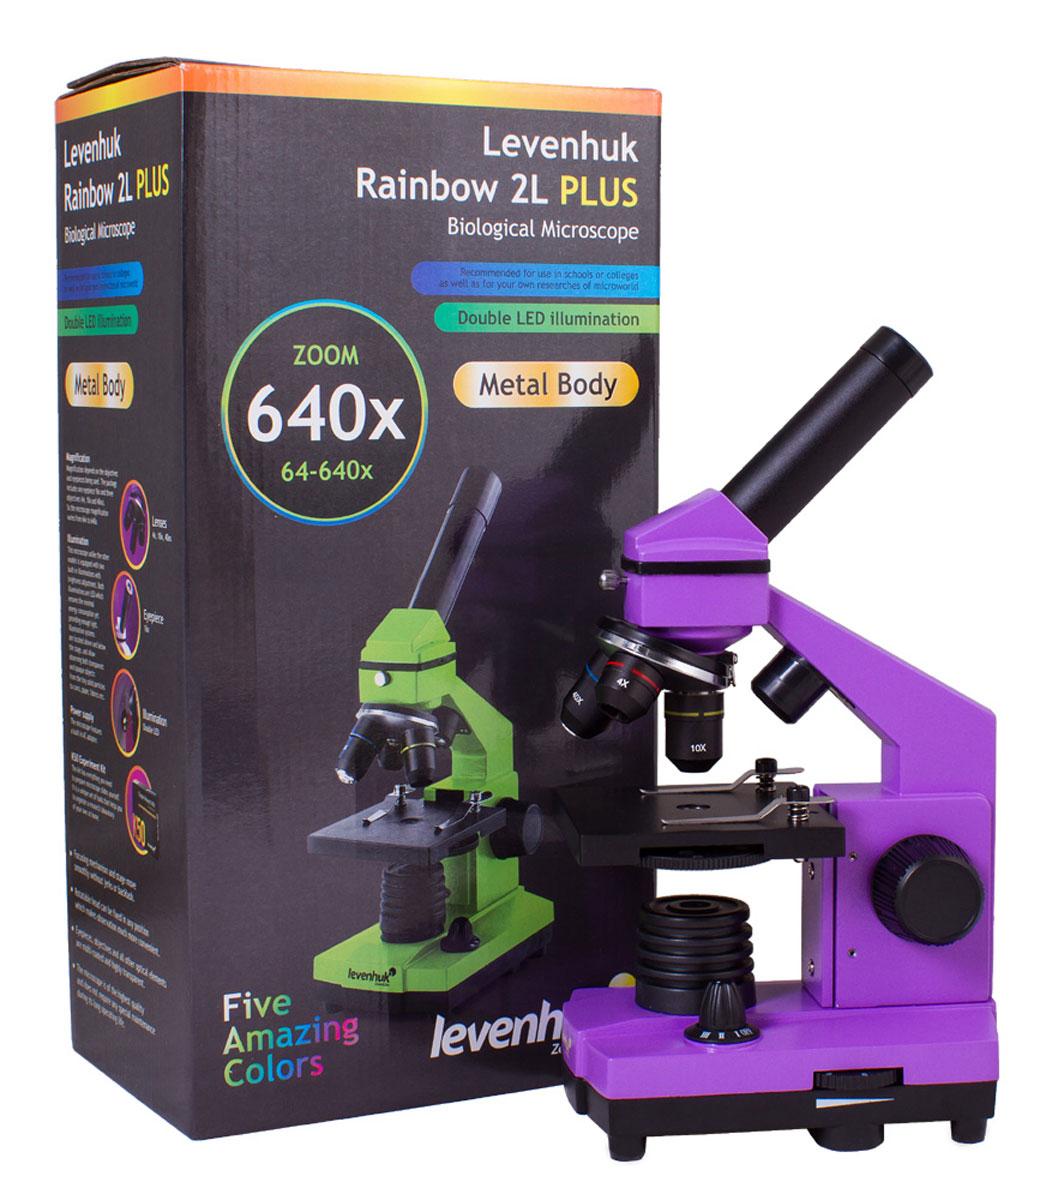 Levenhuk Rainbow 2L Plus Amethyst микроскоп ( XSP-42 metal Pantone #265C )